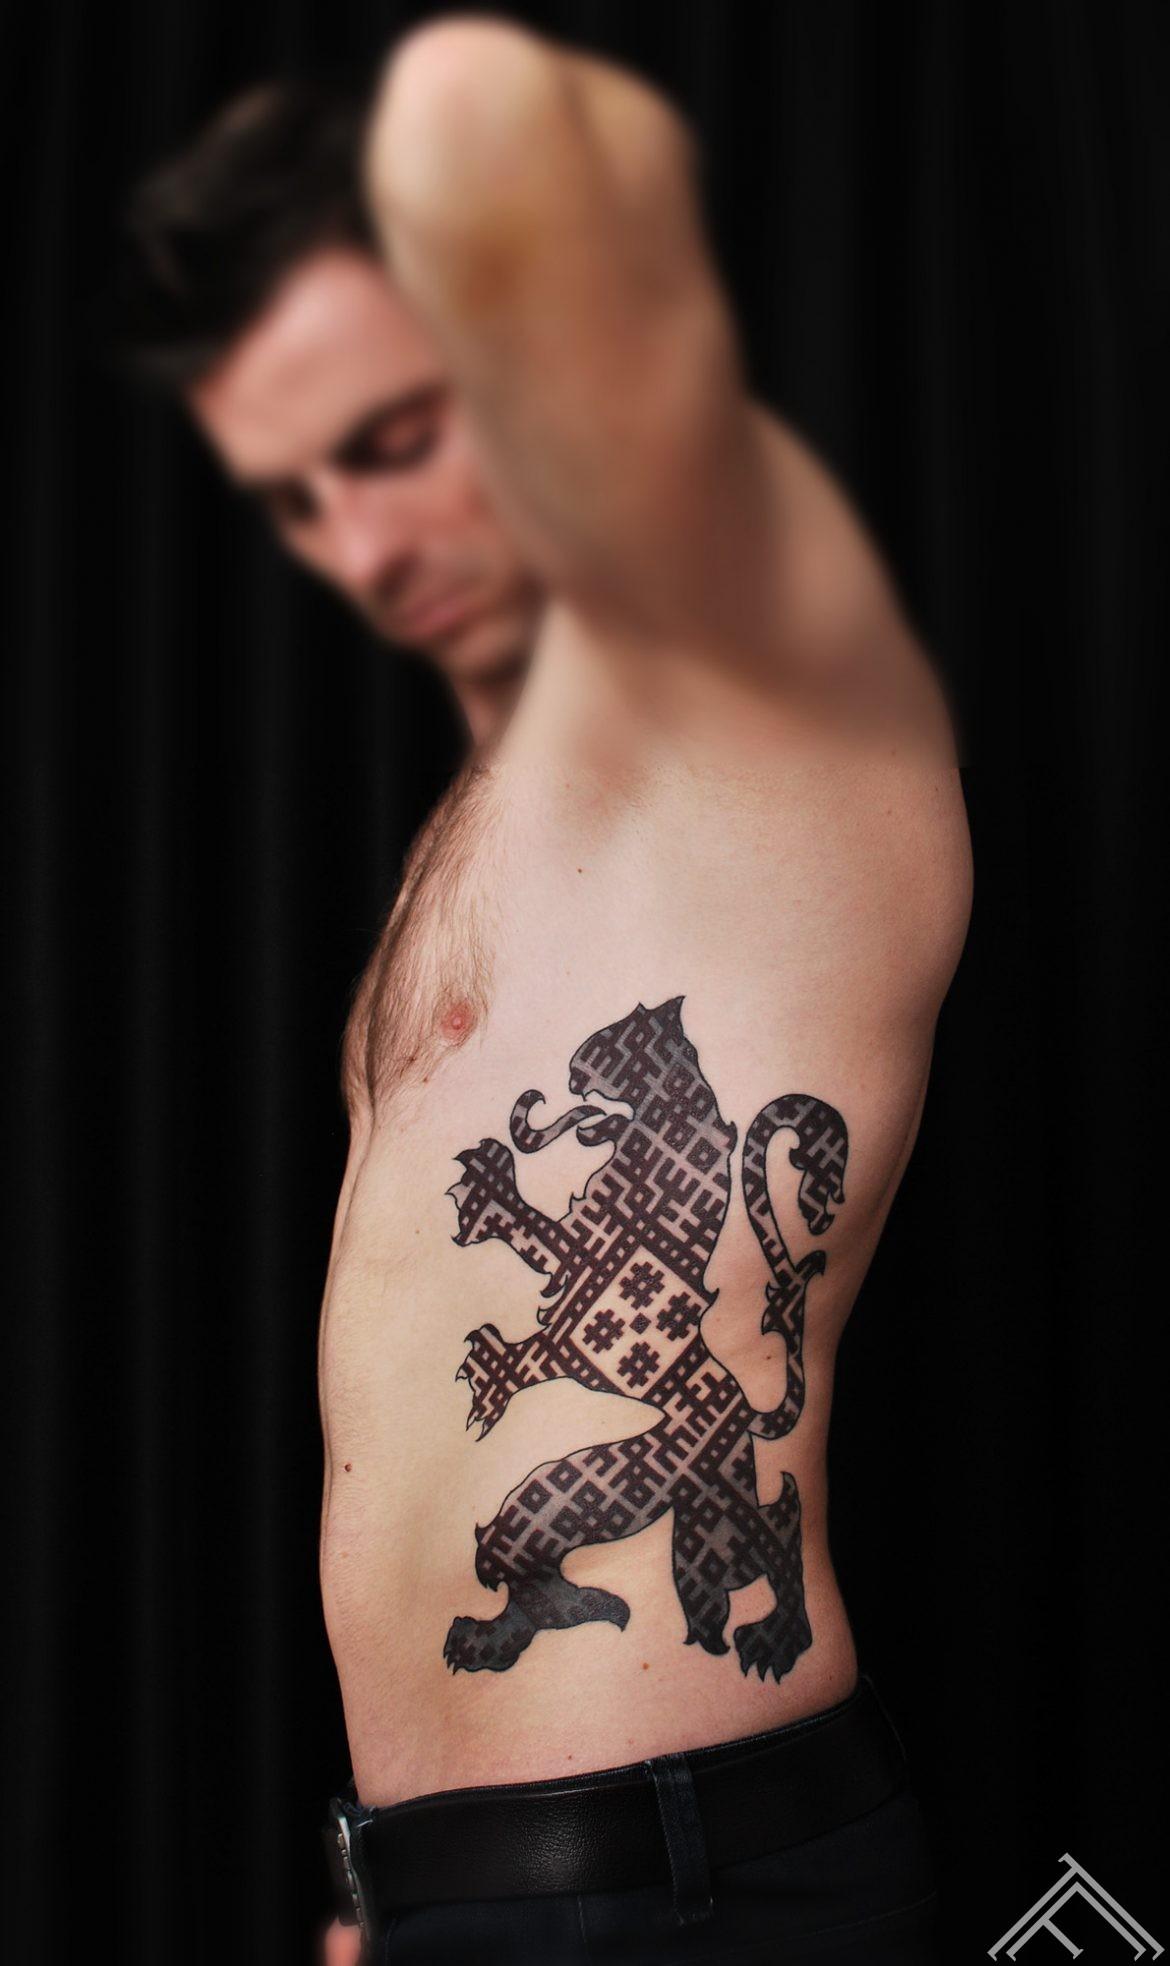 Latvijas_gerbonis_lauva_lielvardes josta_ simboli_ latvju zimes_ tattoofrequency_tetovejums_riga_facebook1